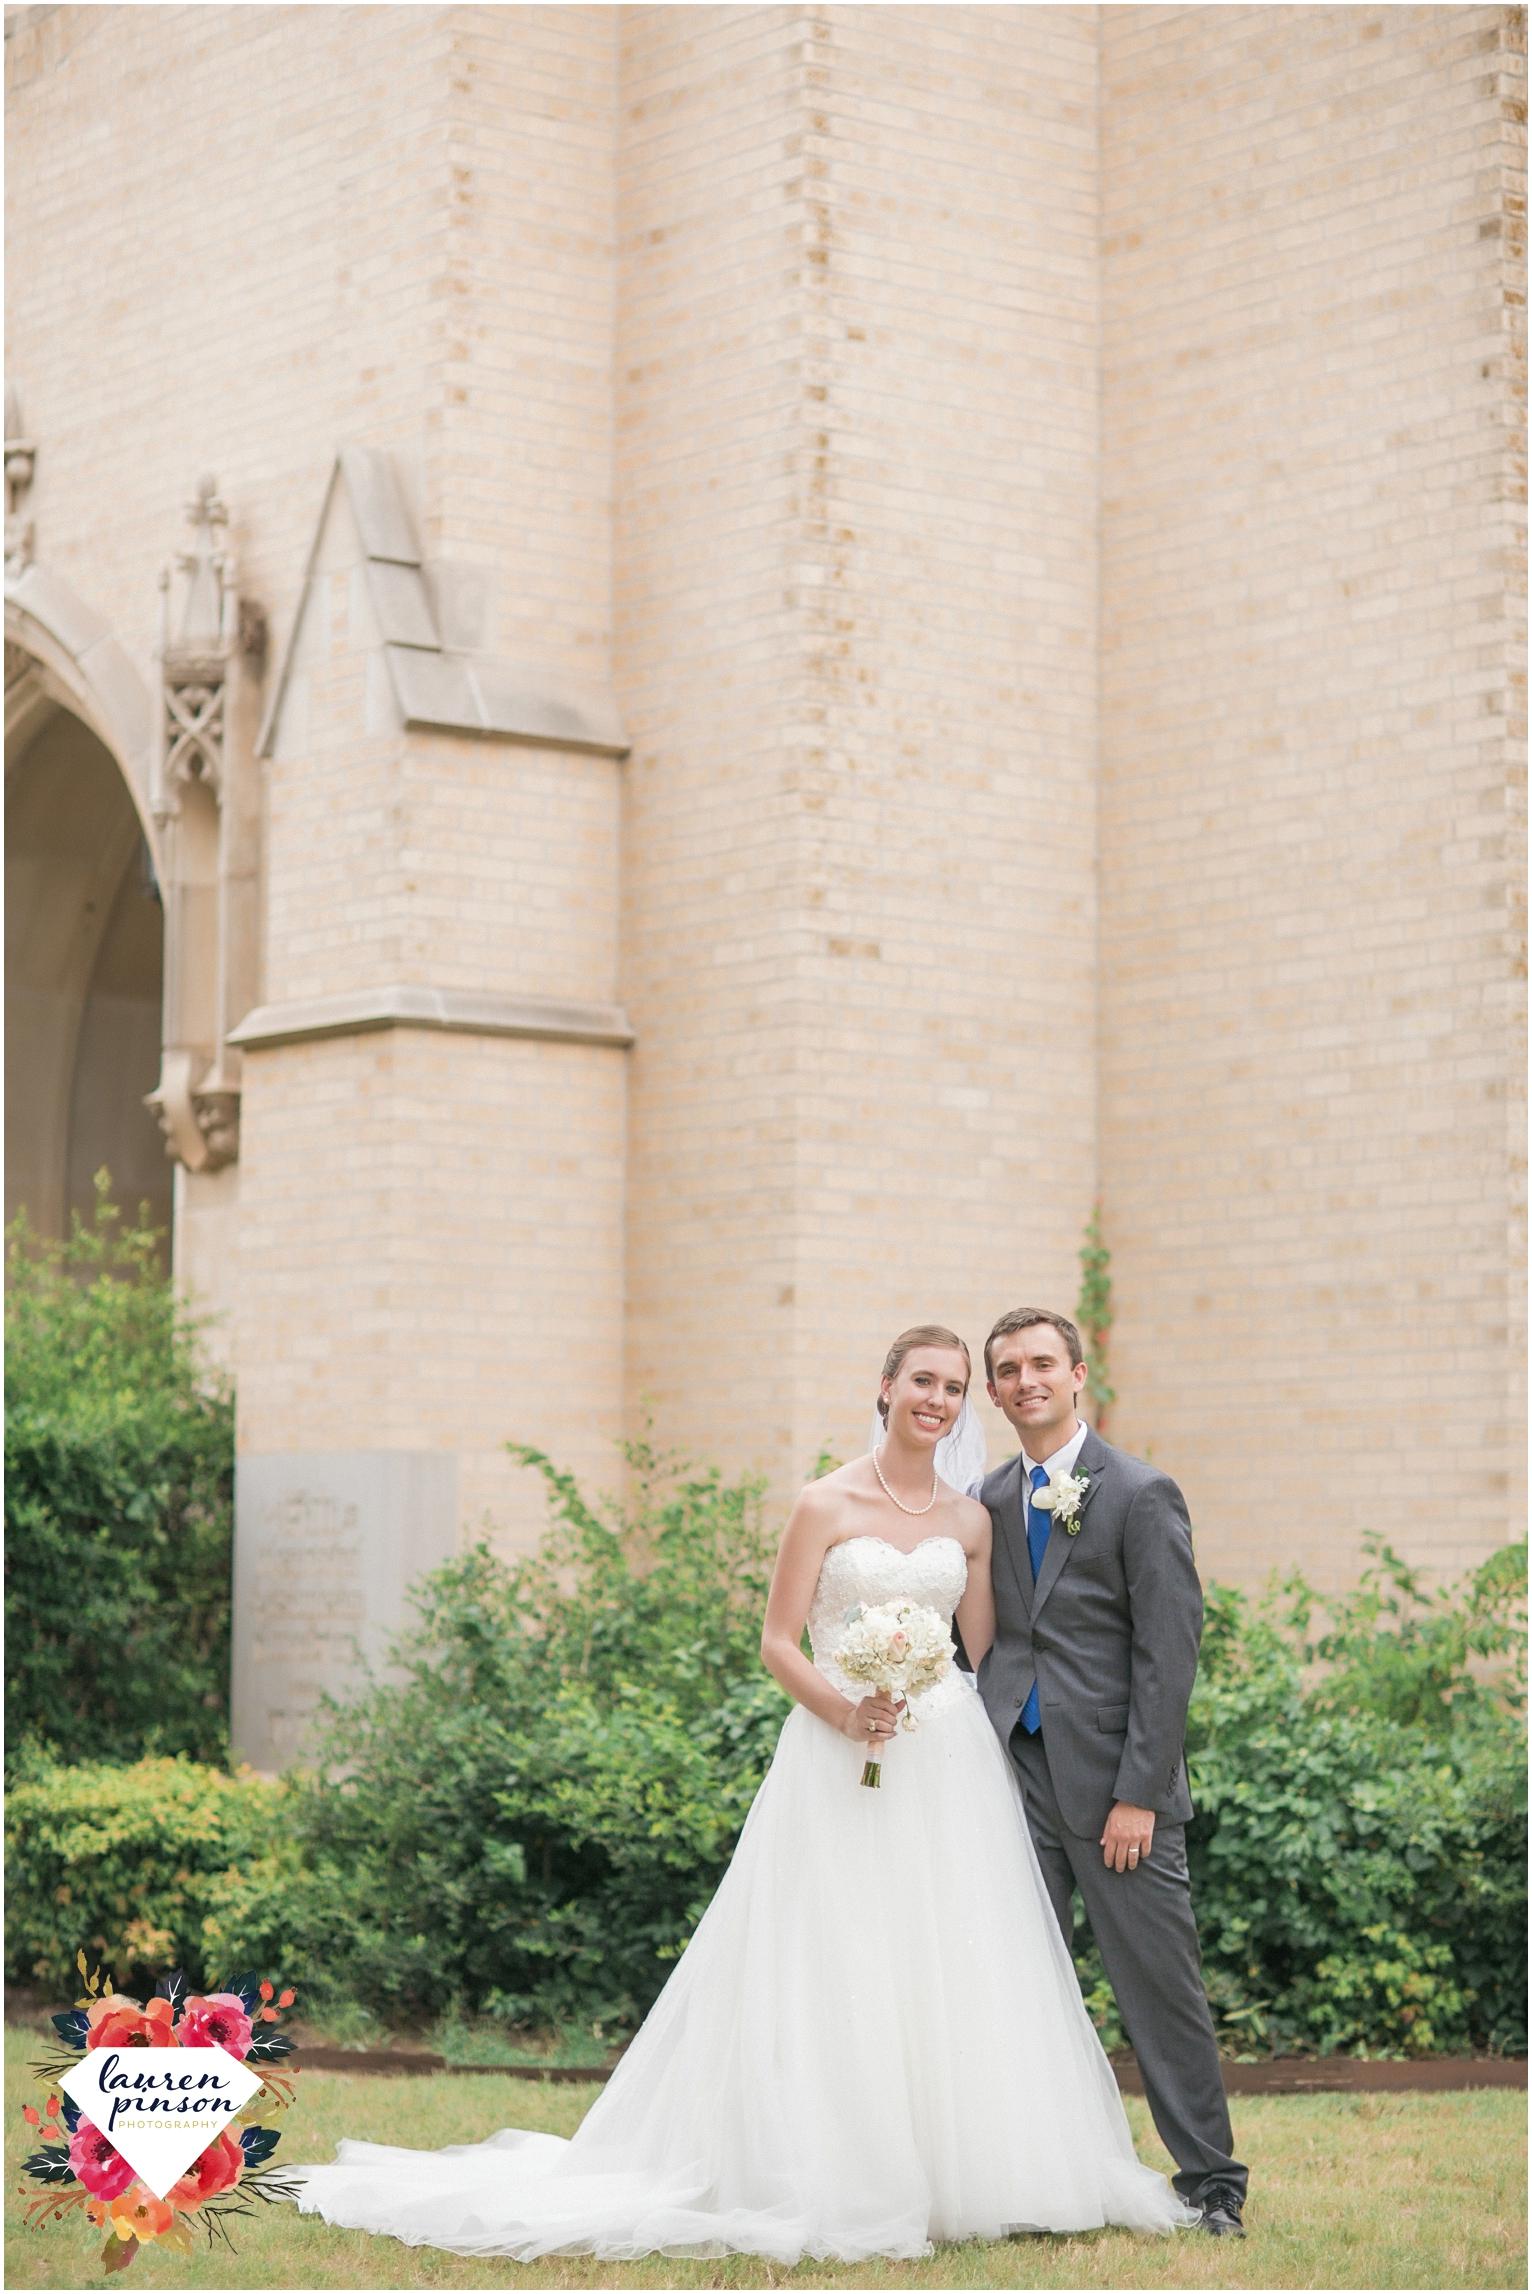 wichita-falls-wedding-photography-at-fain-presbyterian-church-and-the-wellington-timeless-classic-modern-photographer_1165.jpg